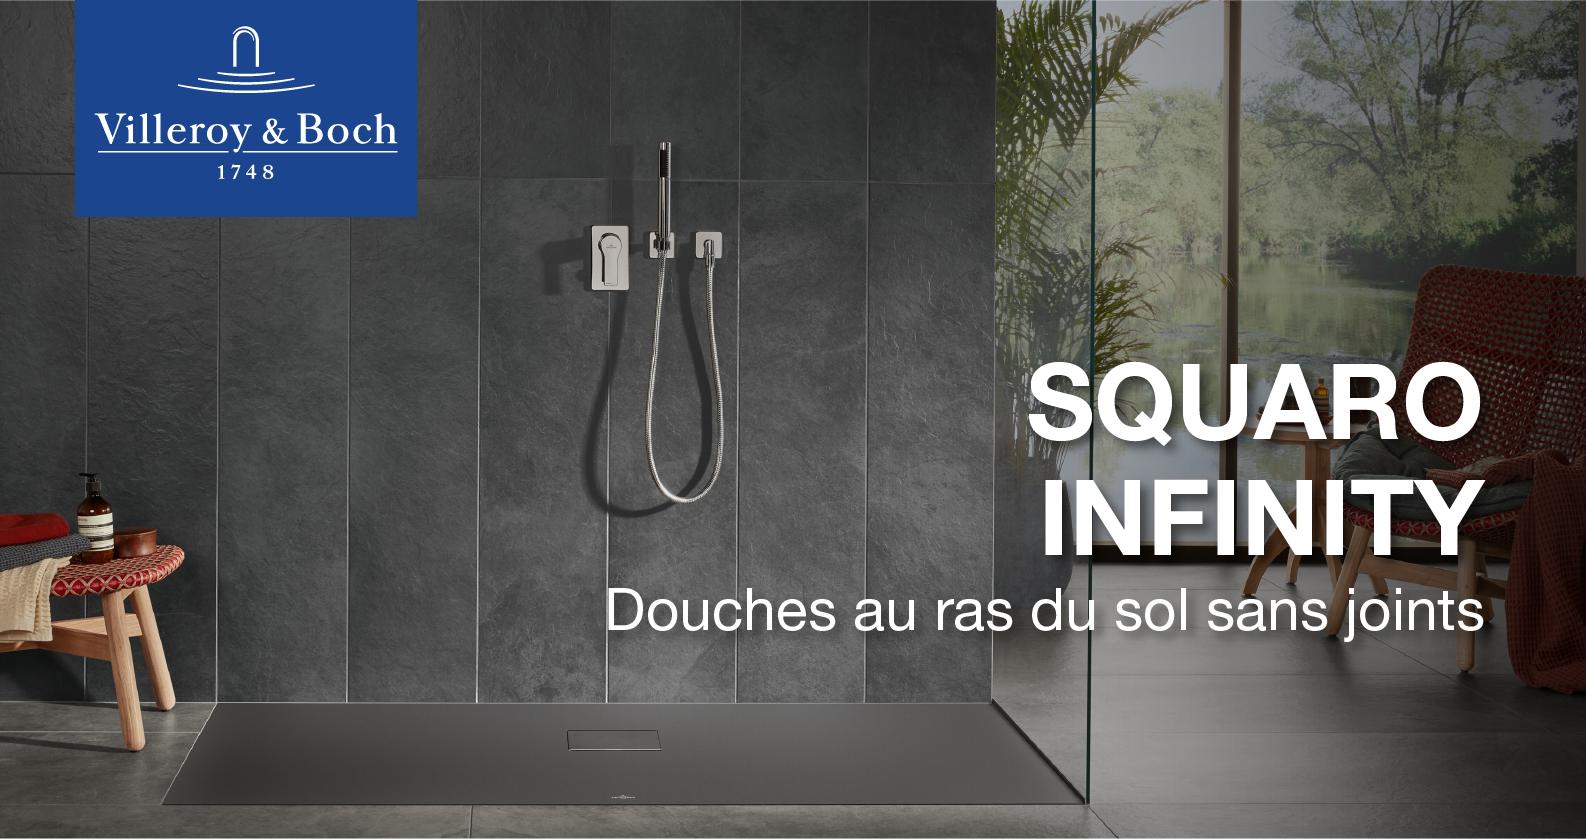 Villeroy & Boch Squaro Infinity Receveur de douche